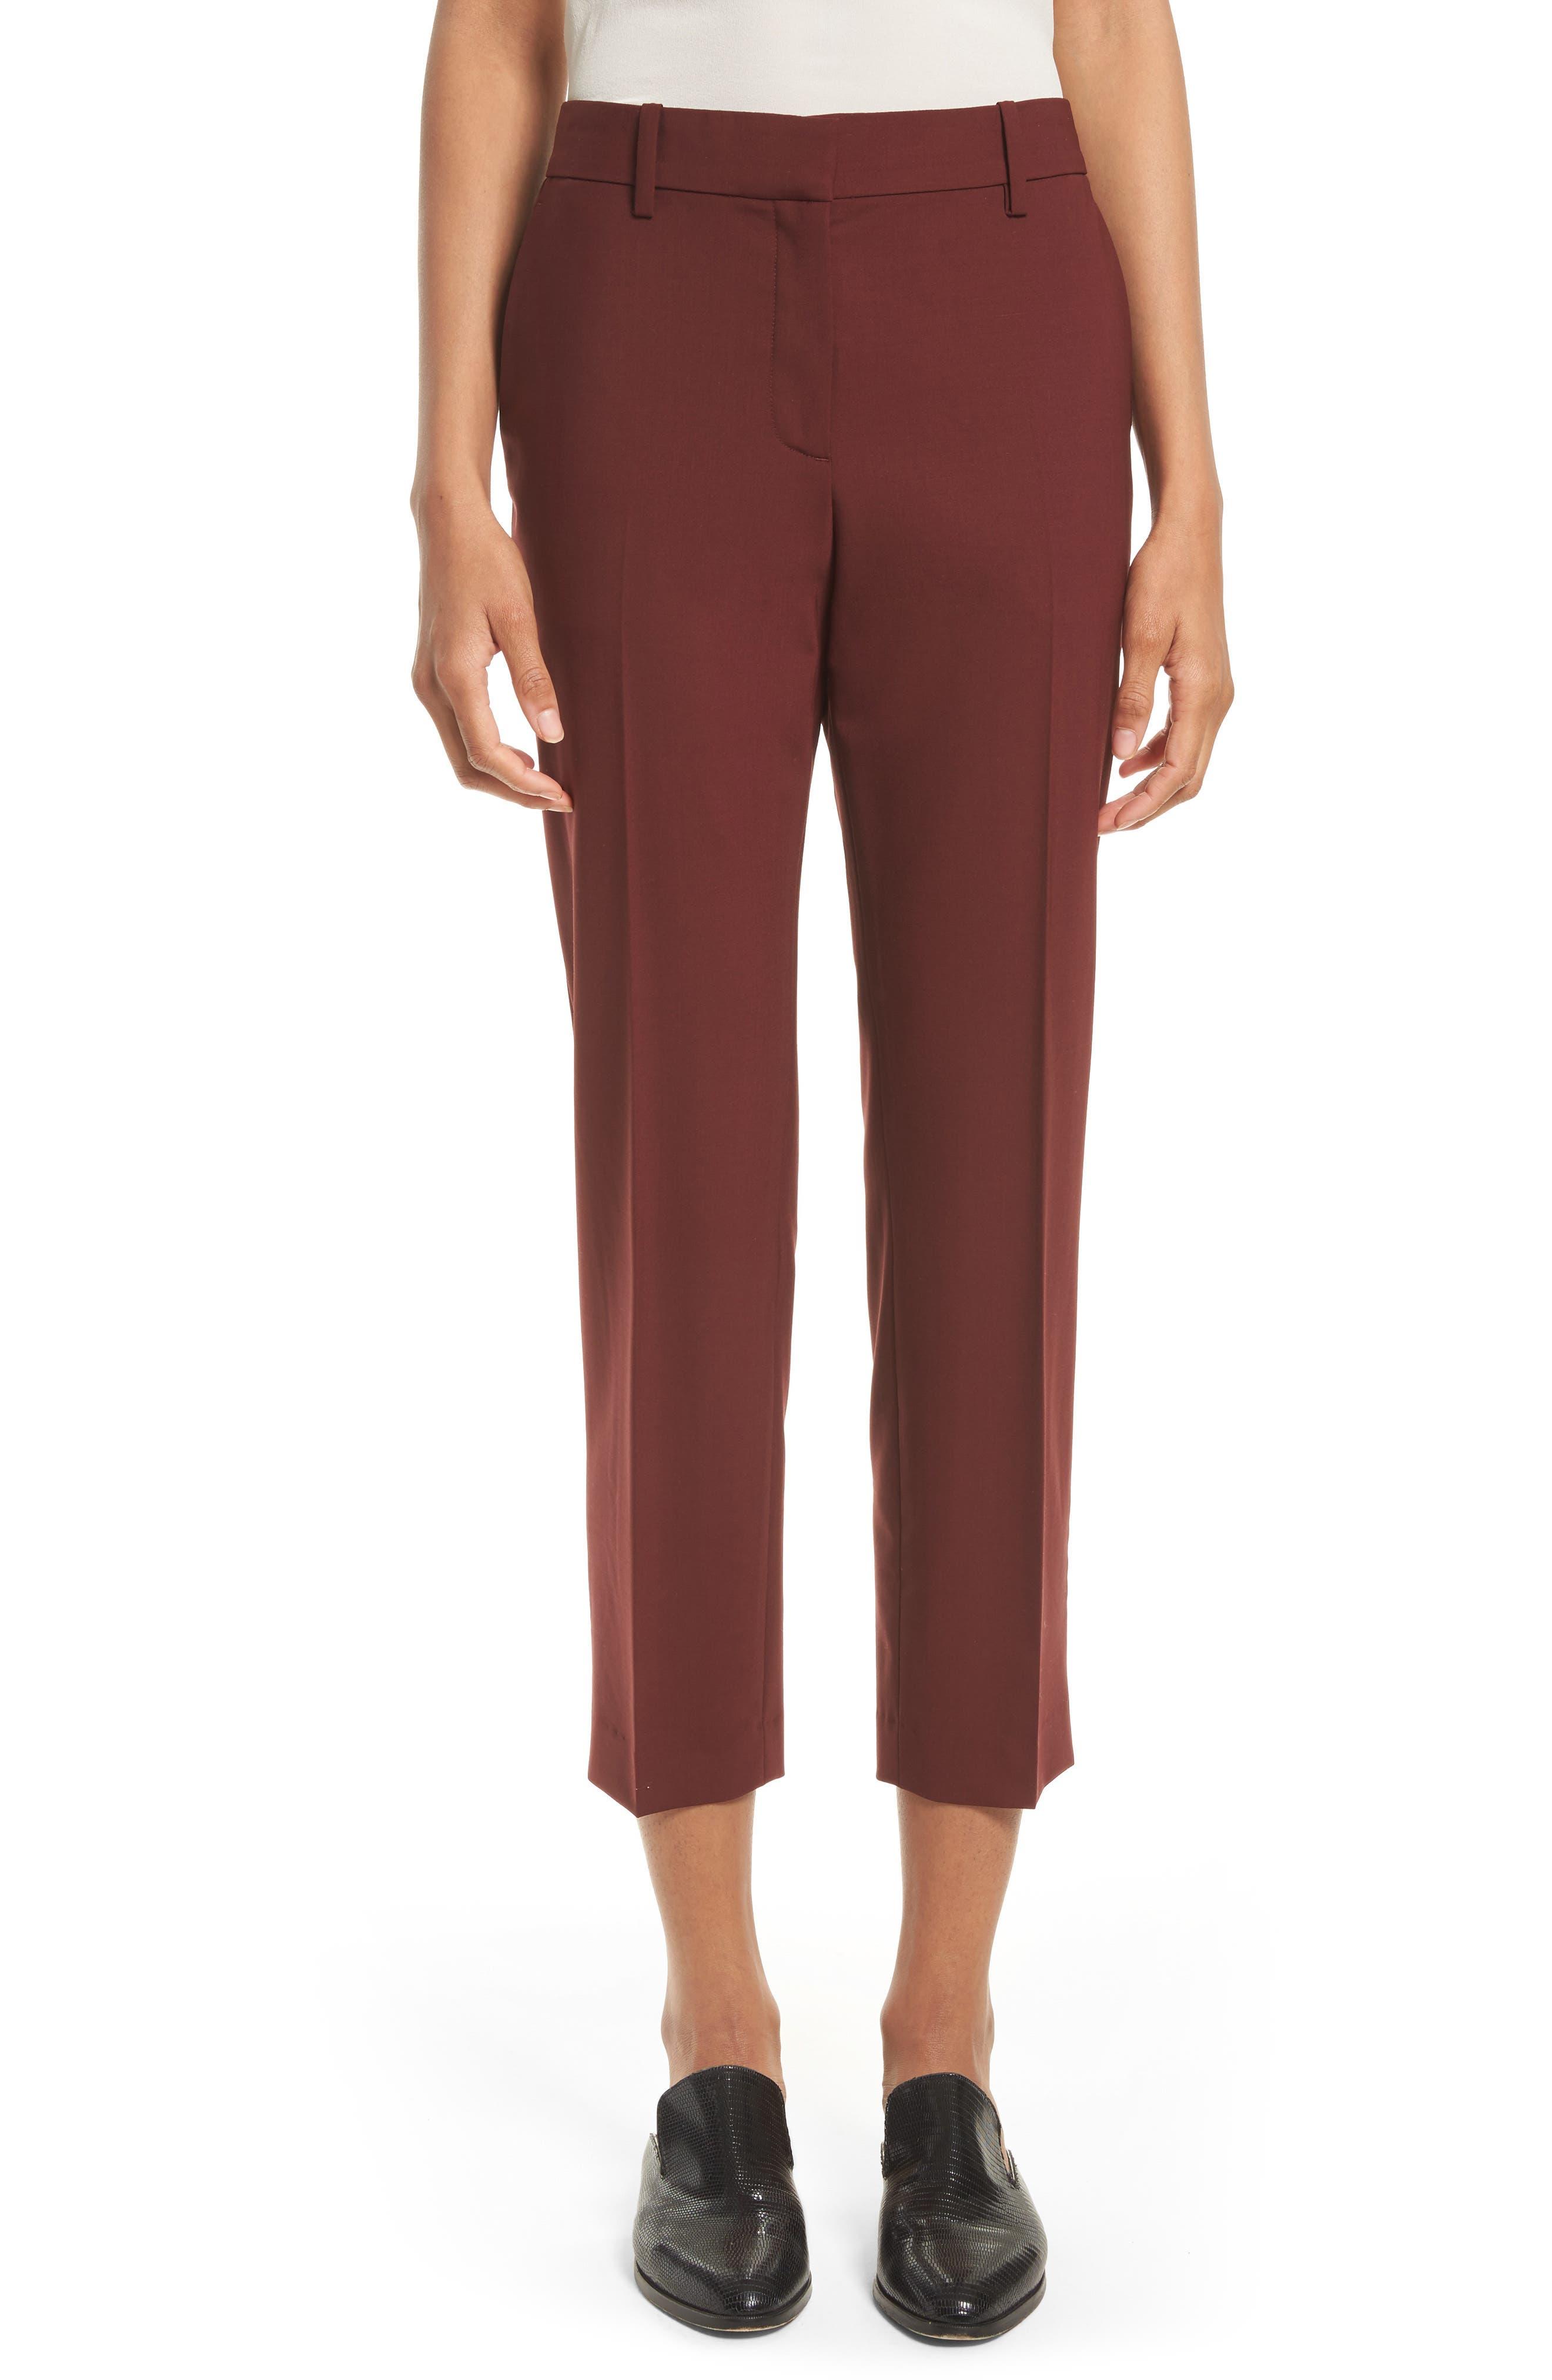 Theory Treeca 2 Betoken Wool Blend Pants